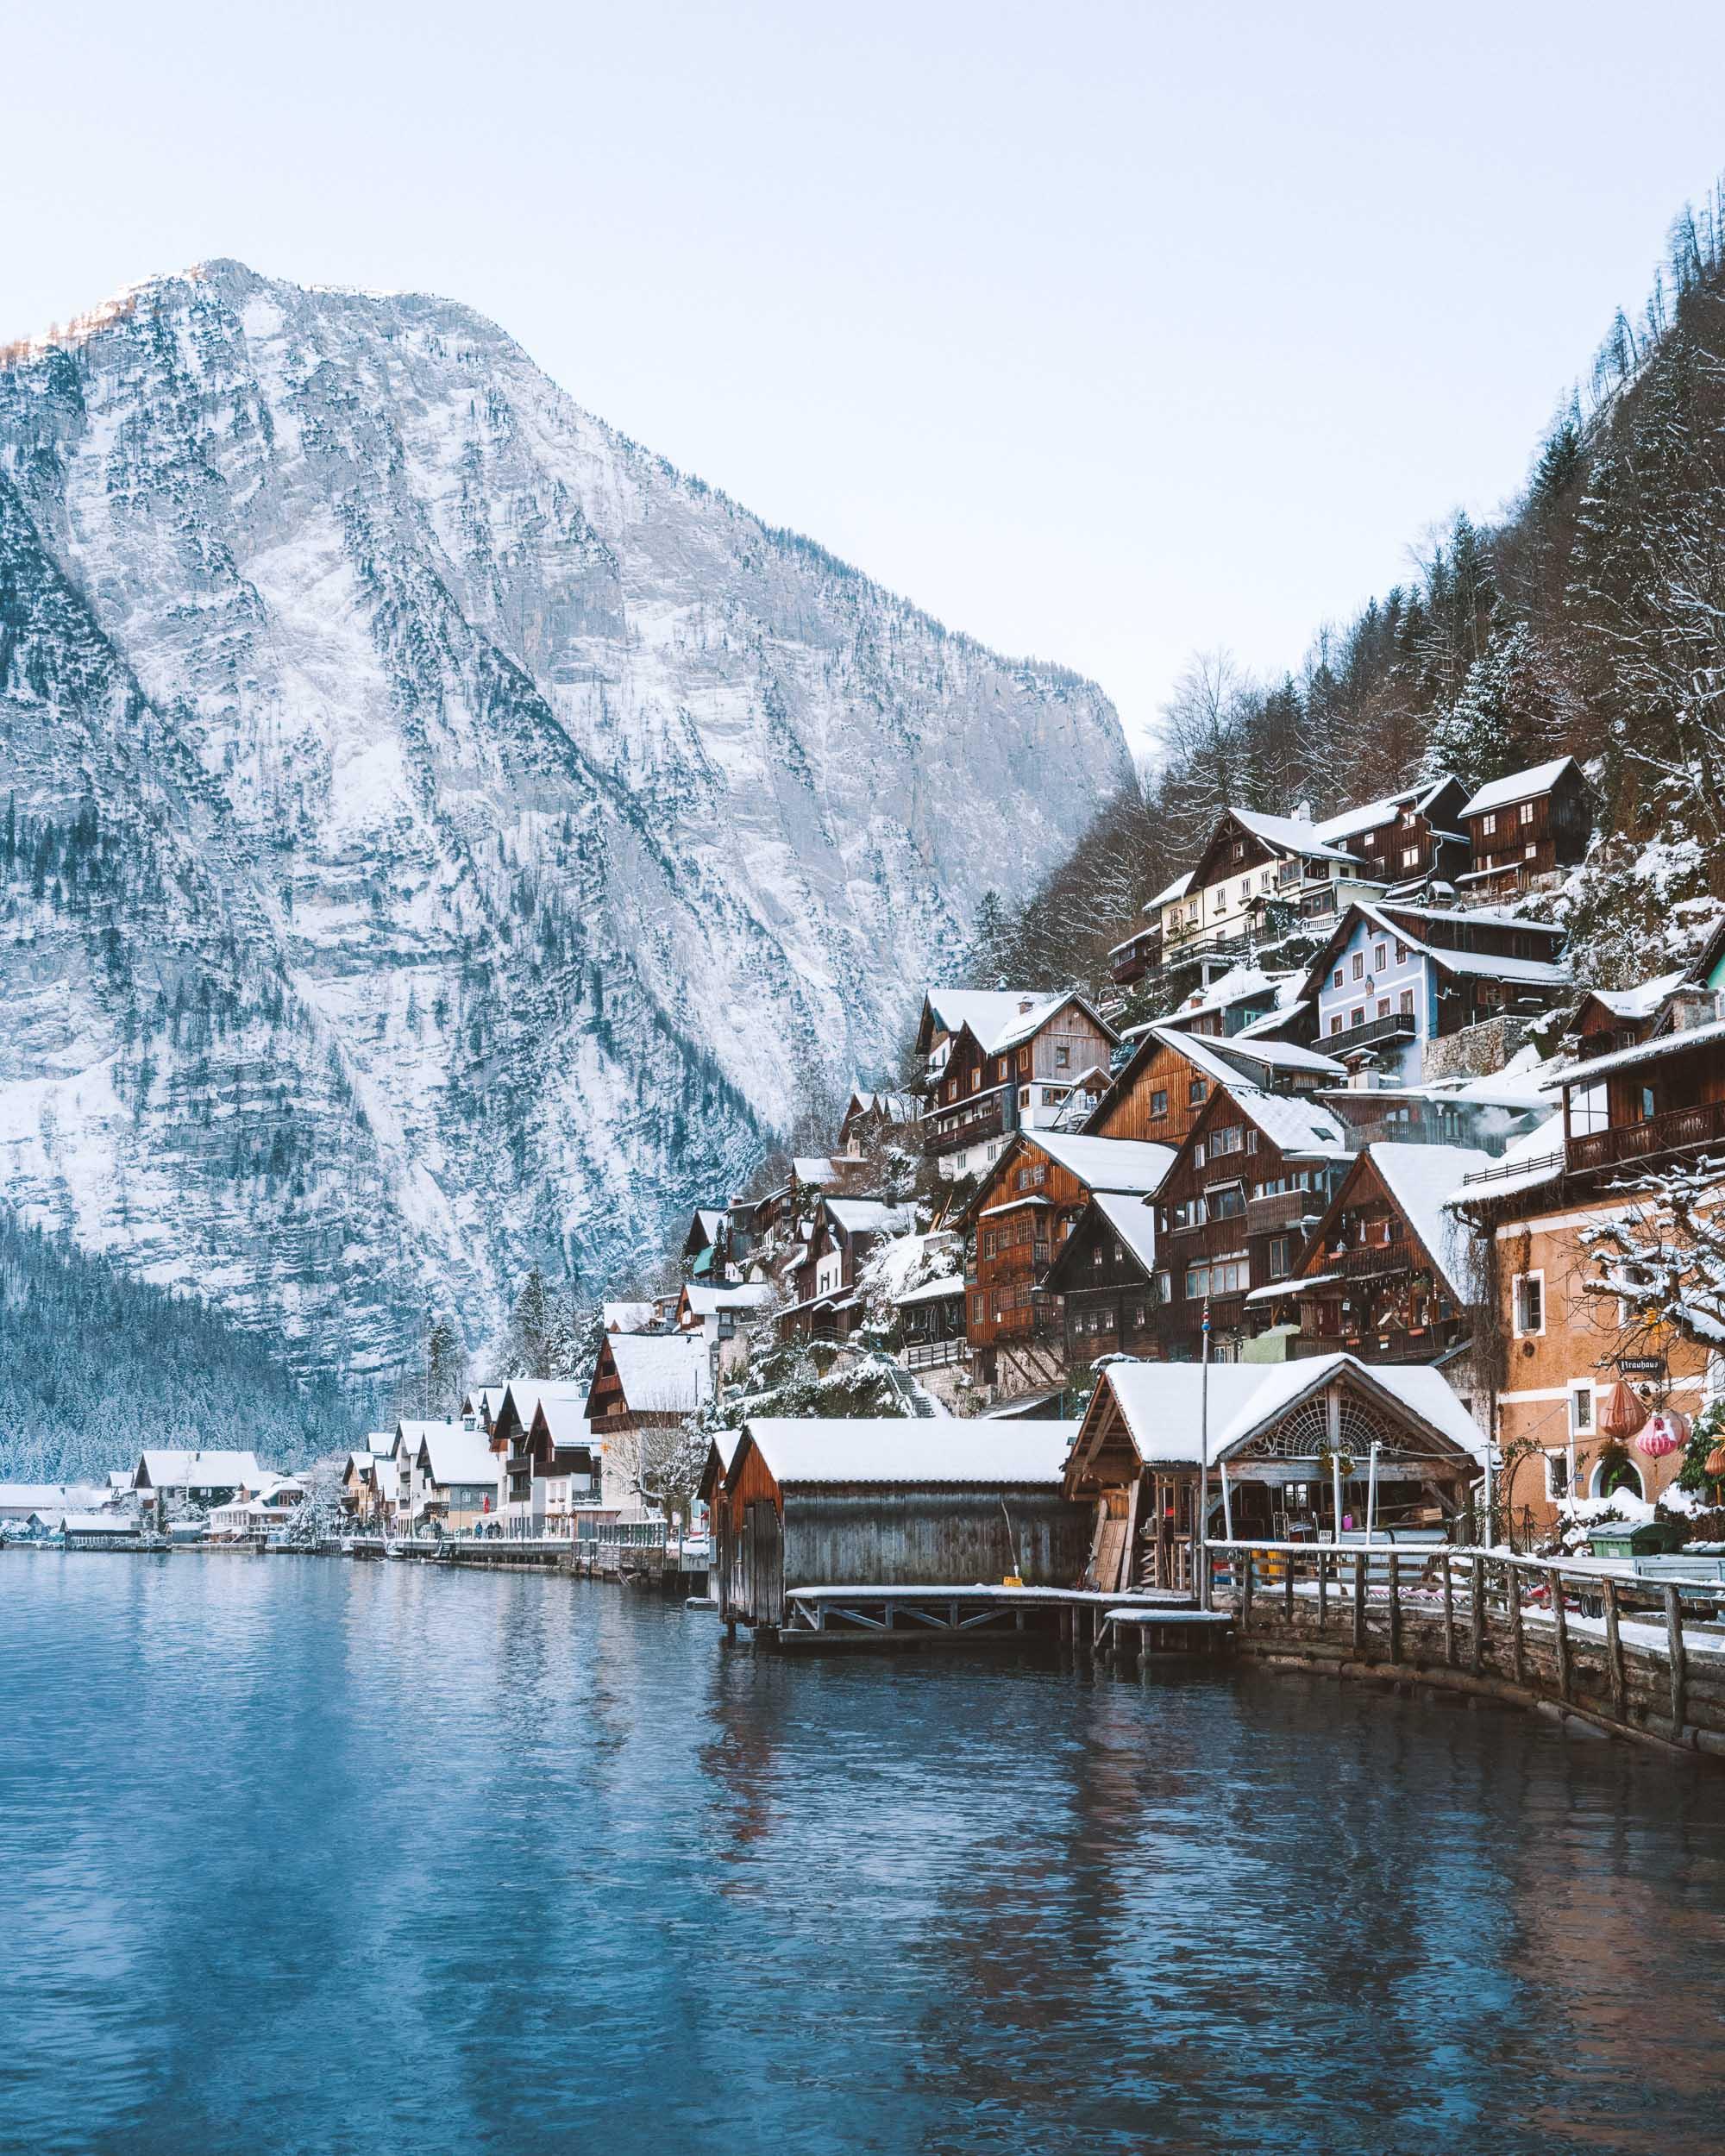 Houses in Hallstatt Austria on the mountainside overlooking the lake